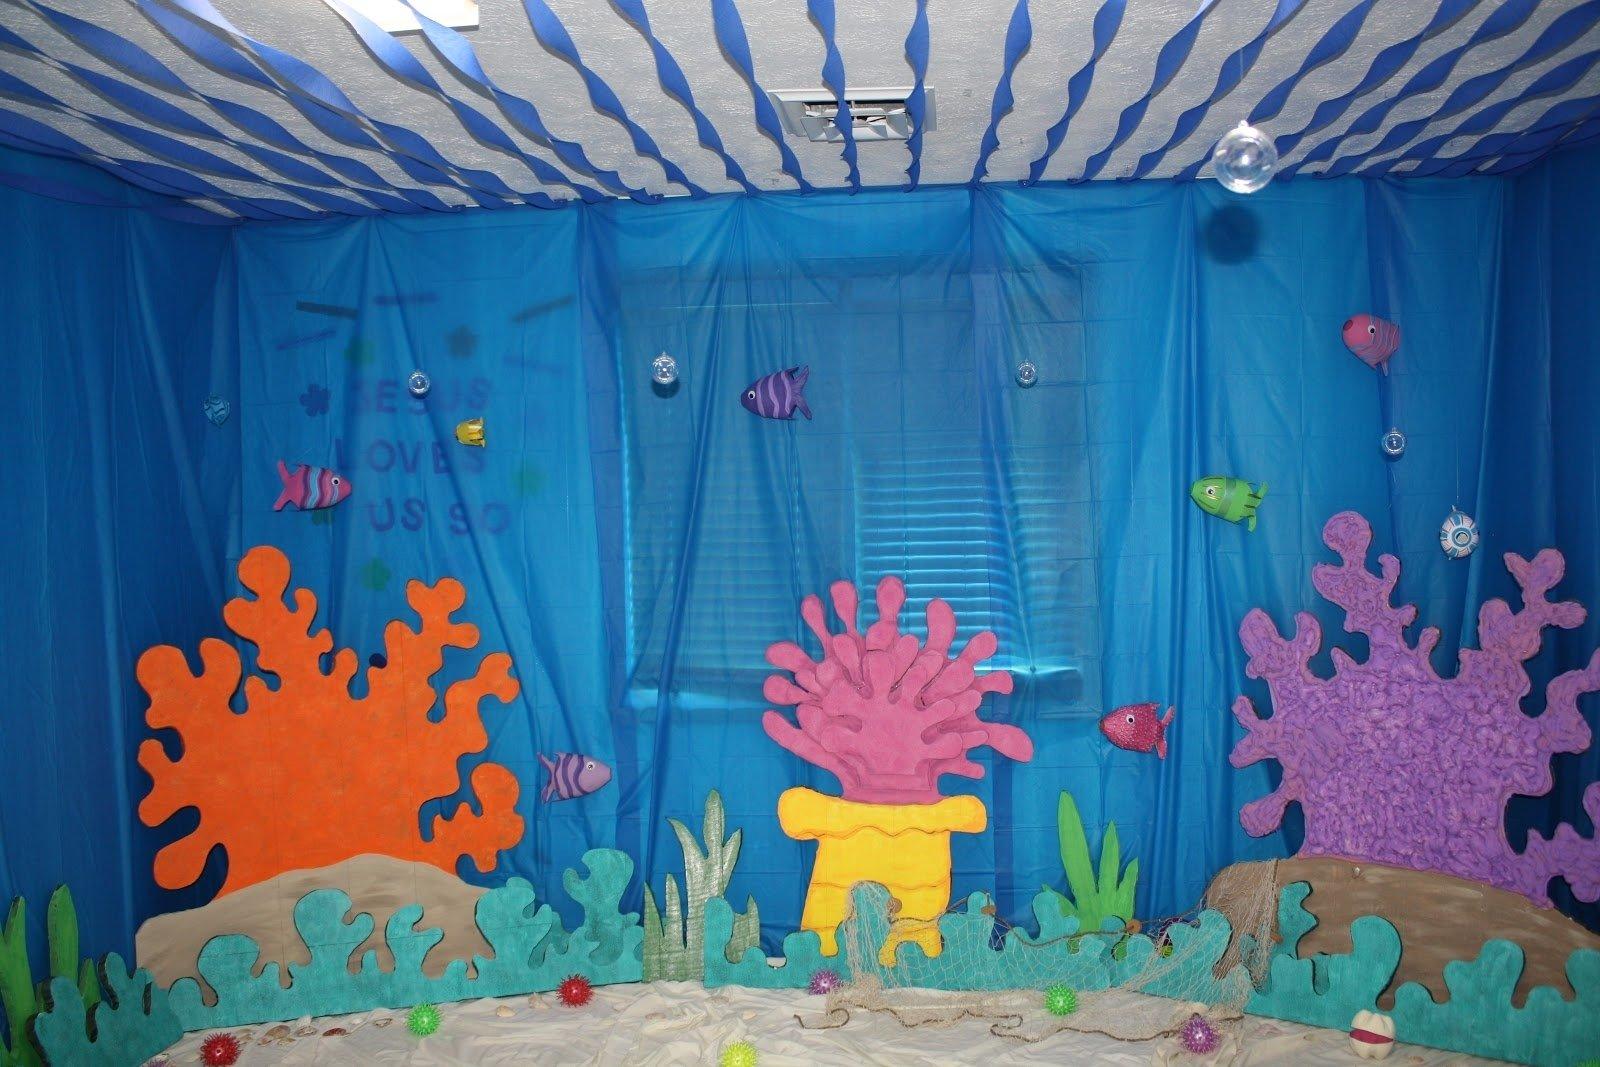 10 Fabulous Under The Sea Party Decoration Ideas under the sea party decorations ideas decor home design 23 mforum 2021